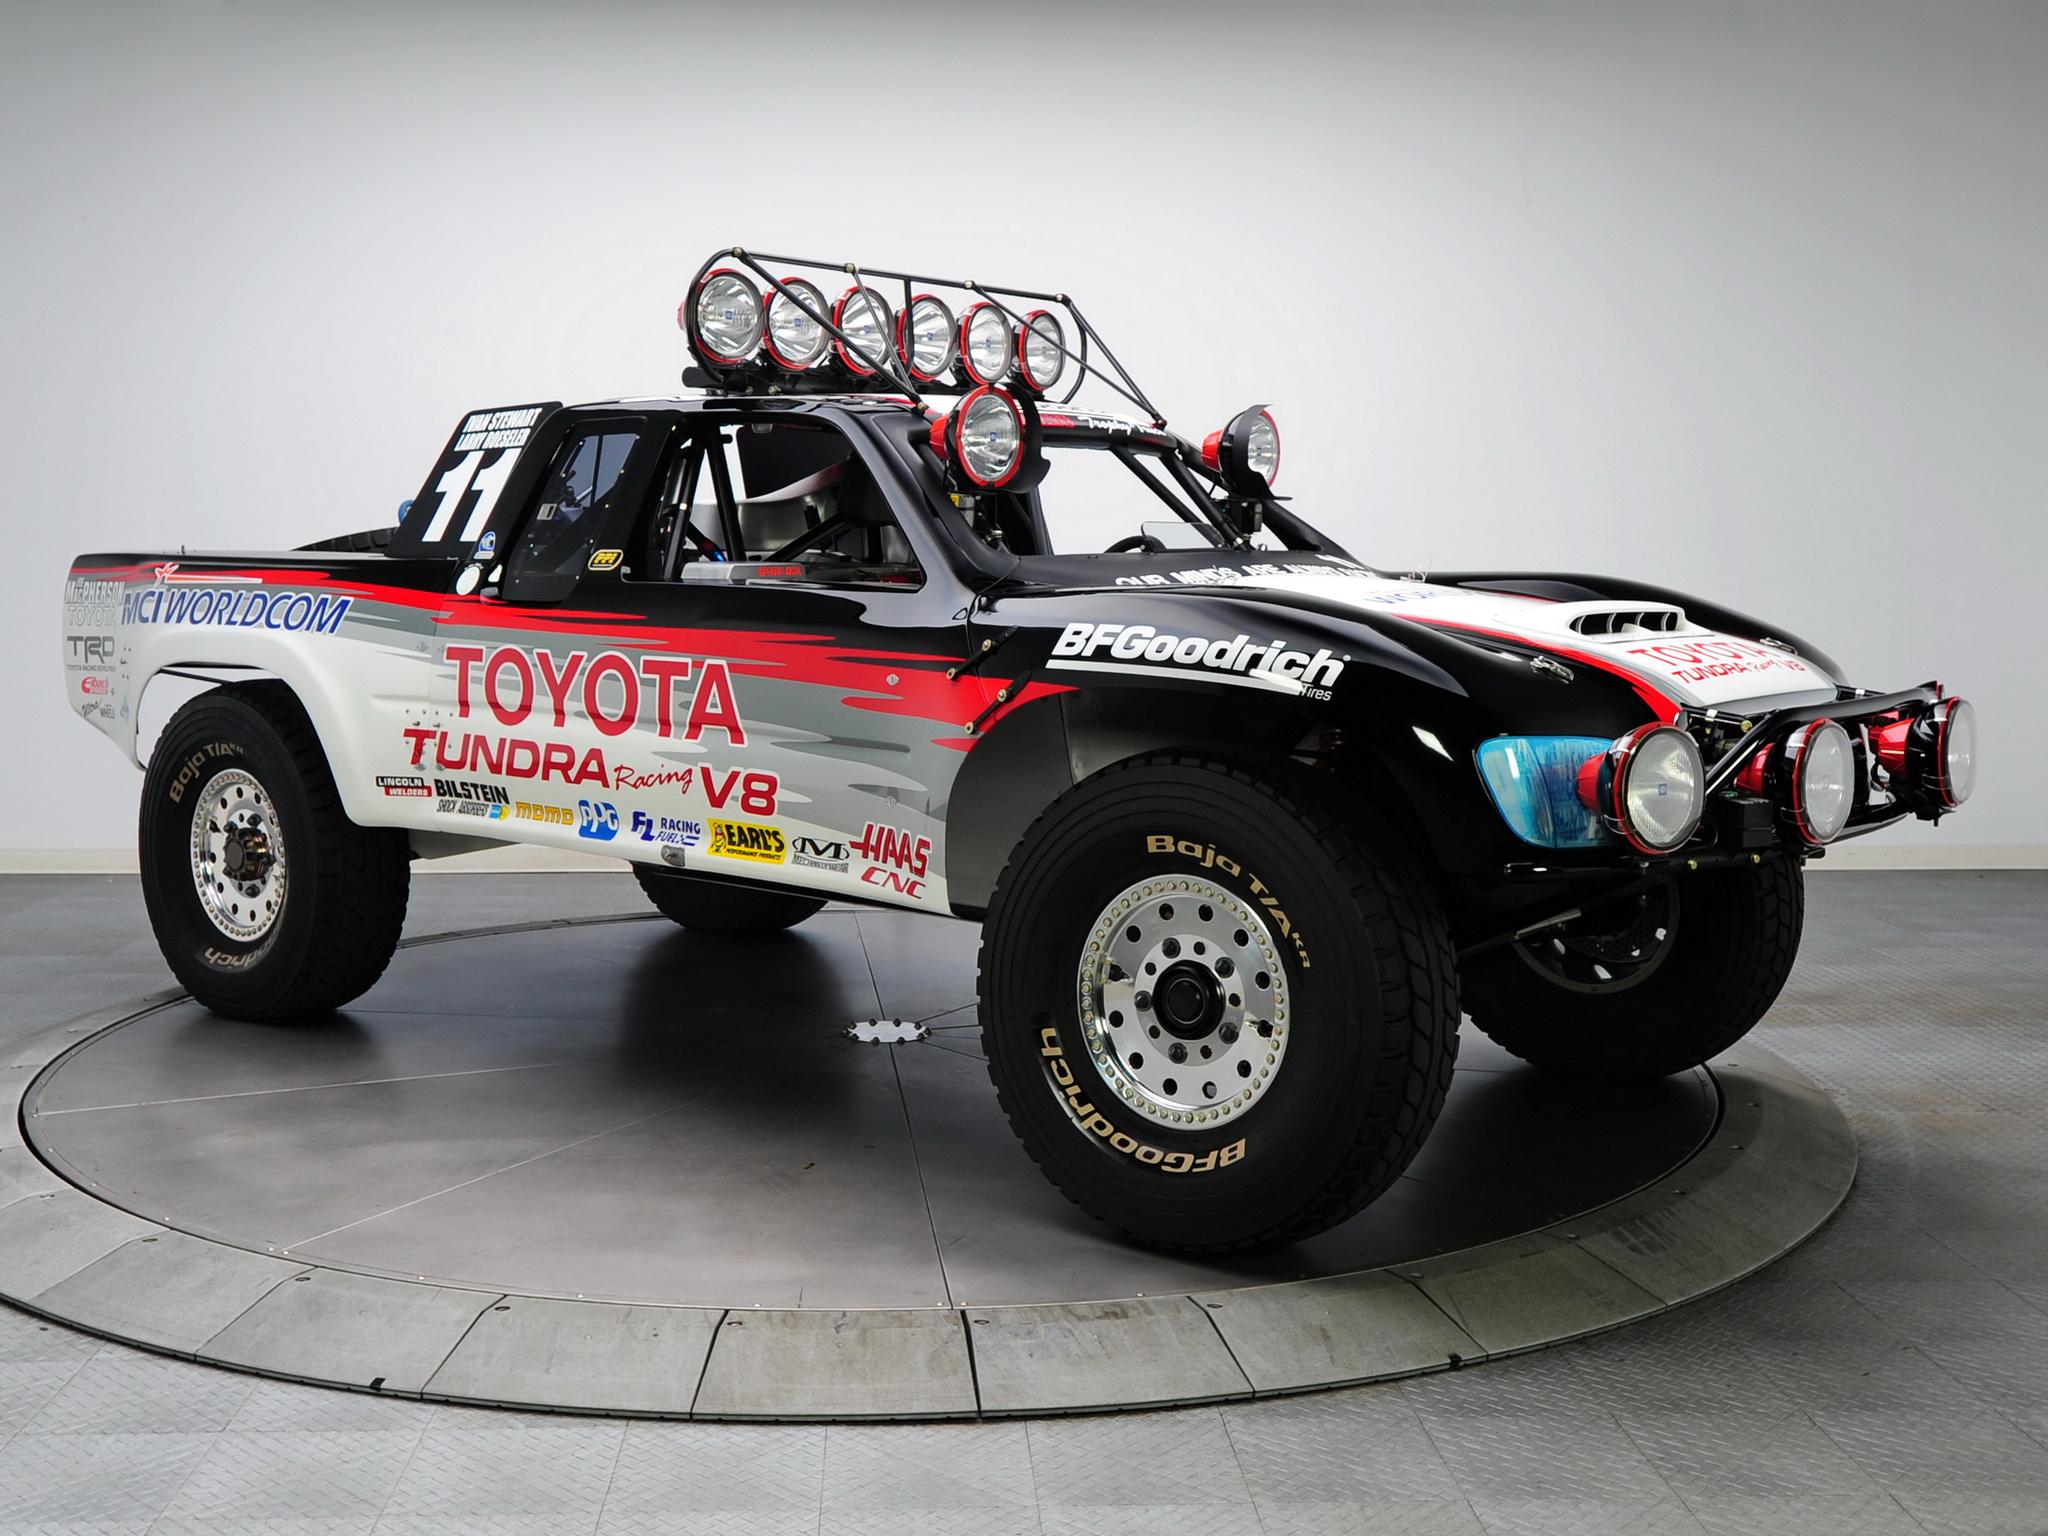 1994 PPI Toyota Trophy Truck race racing offroad pickup wallpaper 2048x1536